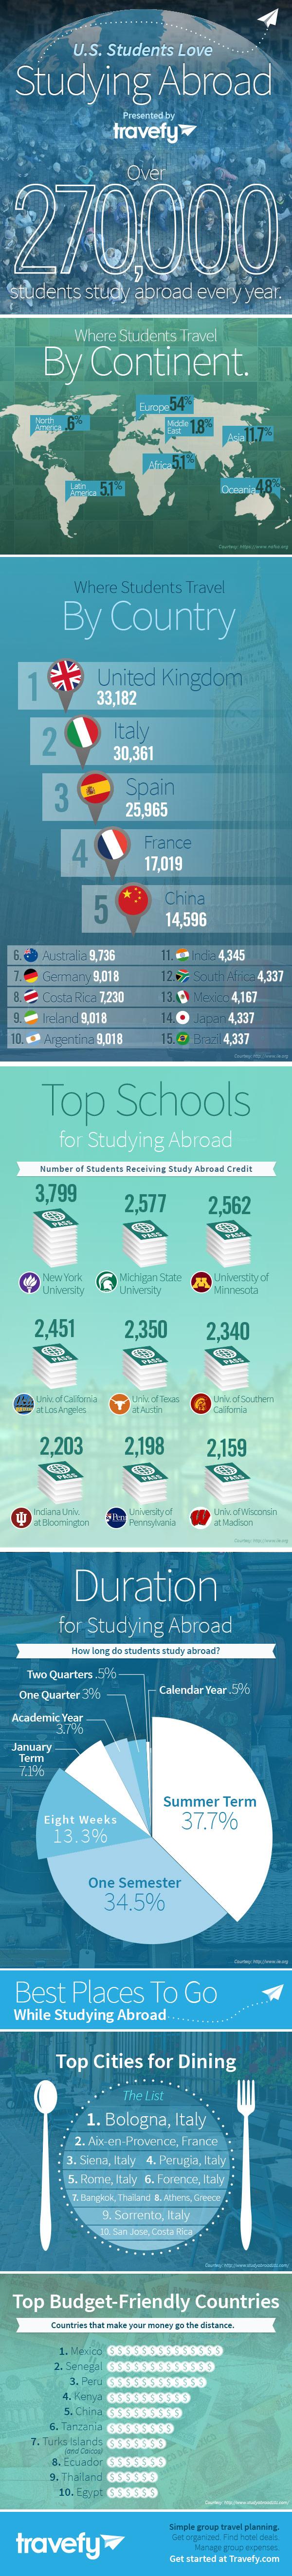 fun-student-study-abroad-data_525e9cc3241ee